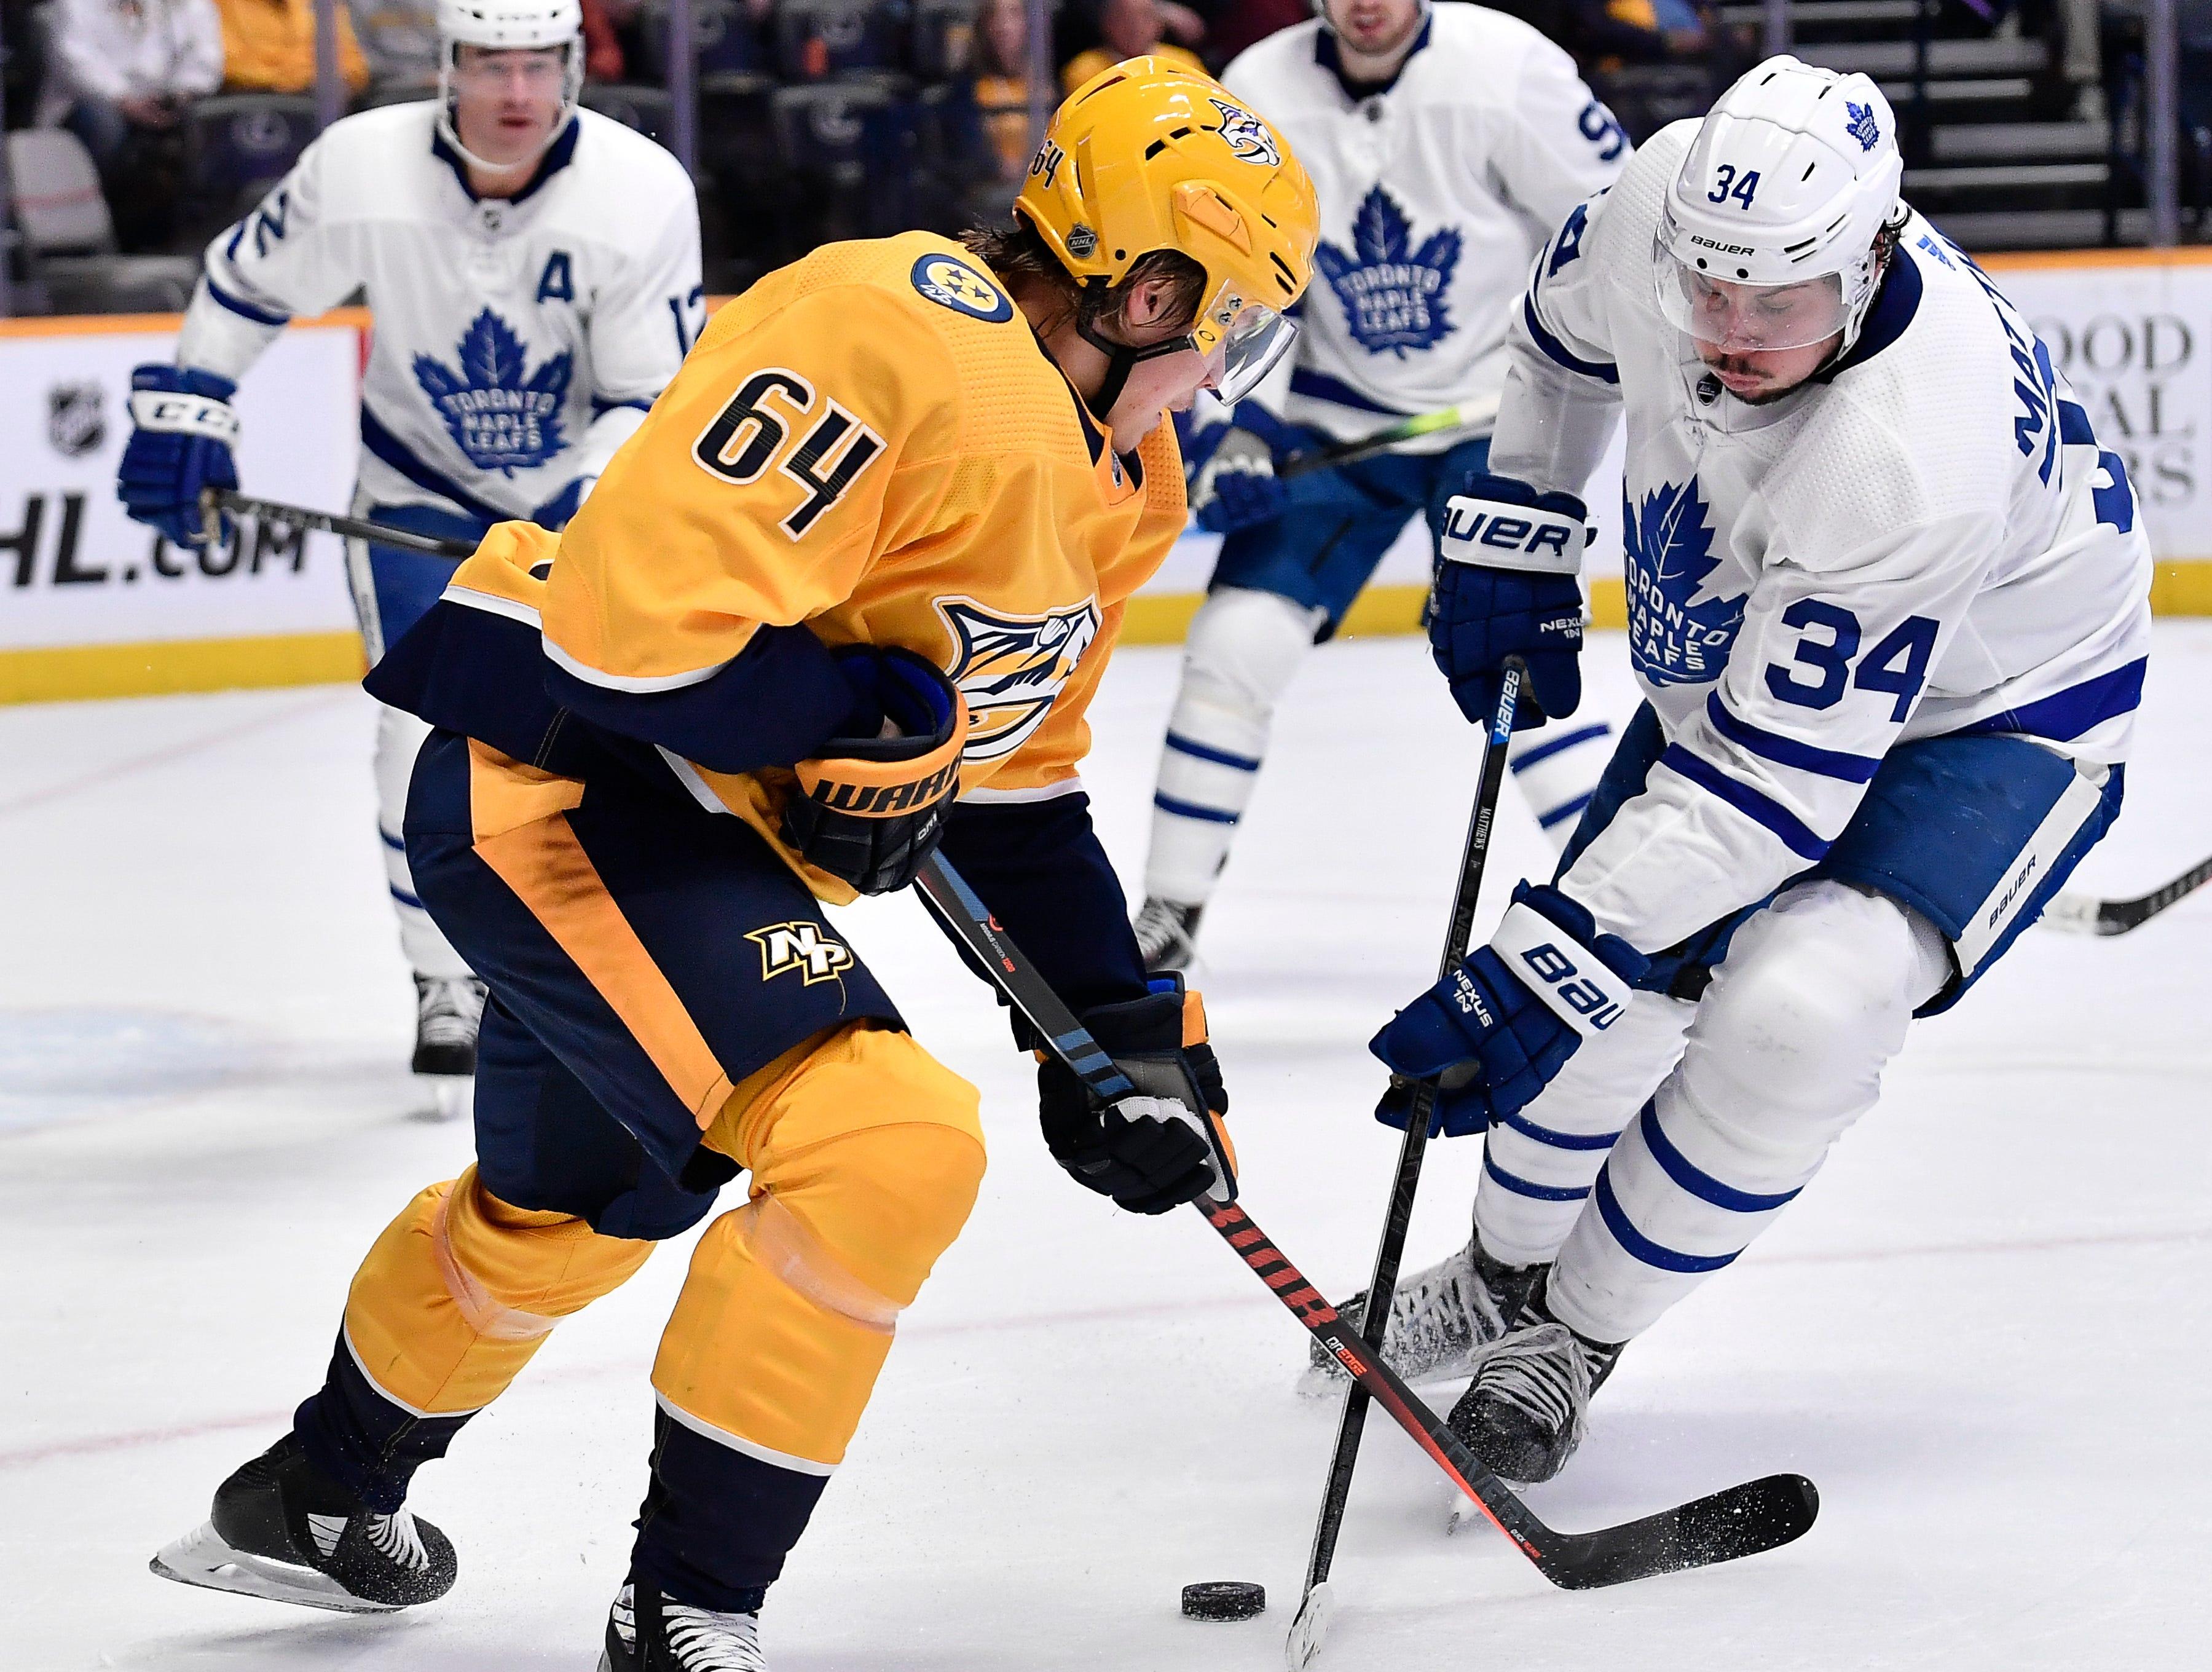 Predators center Mikael Granlund (64) fights Maple Leafs center Auston Matthews (34) for the puck during the first period at Bridgestone Arena Tuesday, March 19, 2019 in Nashville, Tenn.